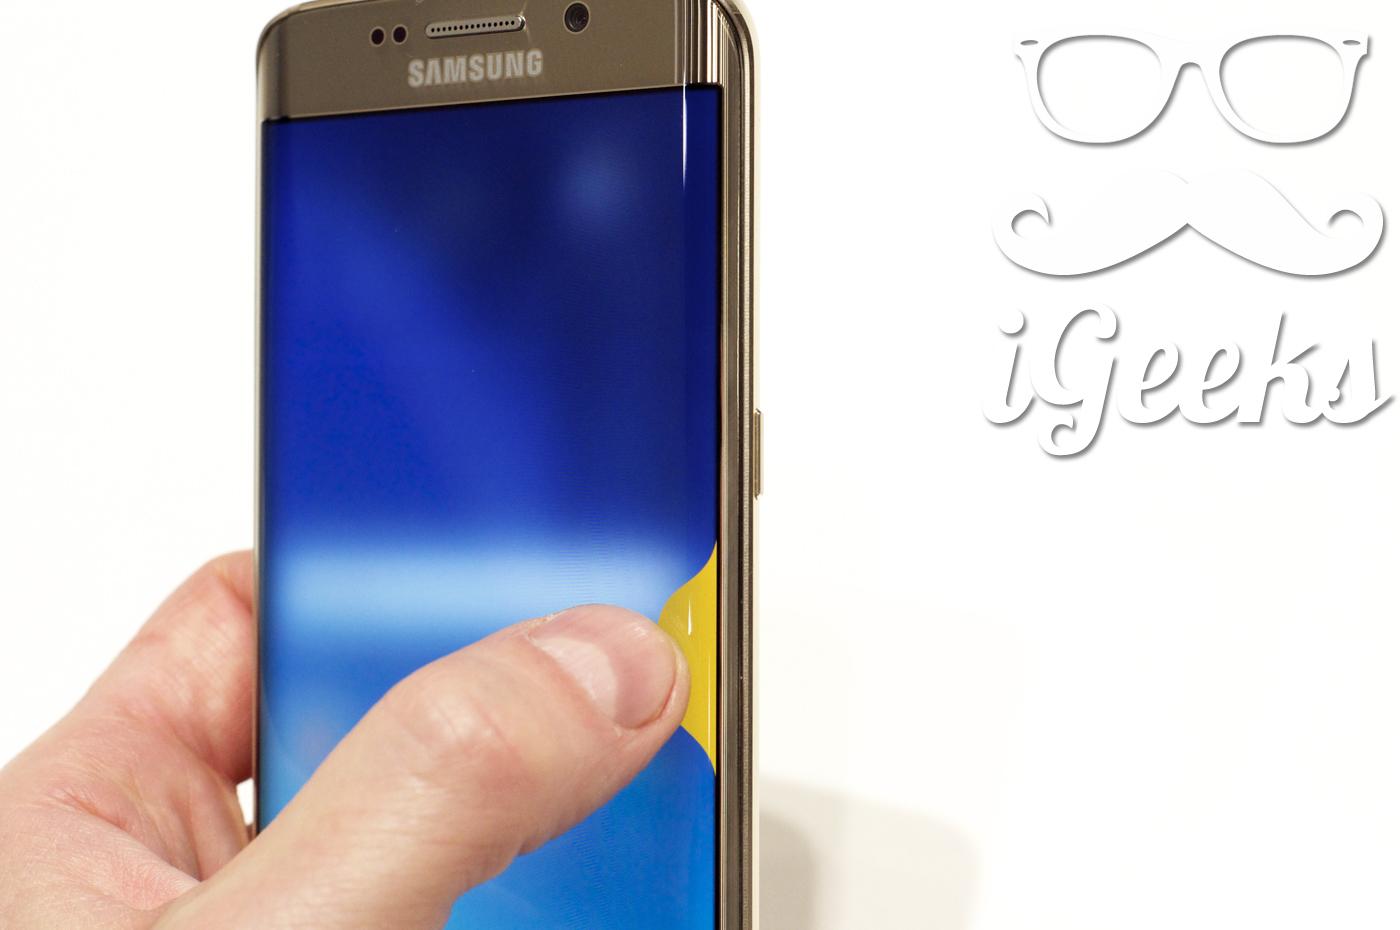 iGeeks-Samsung-S6-MWC2015-25